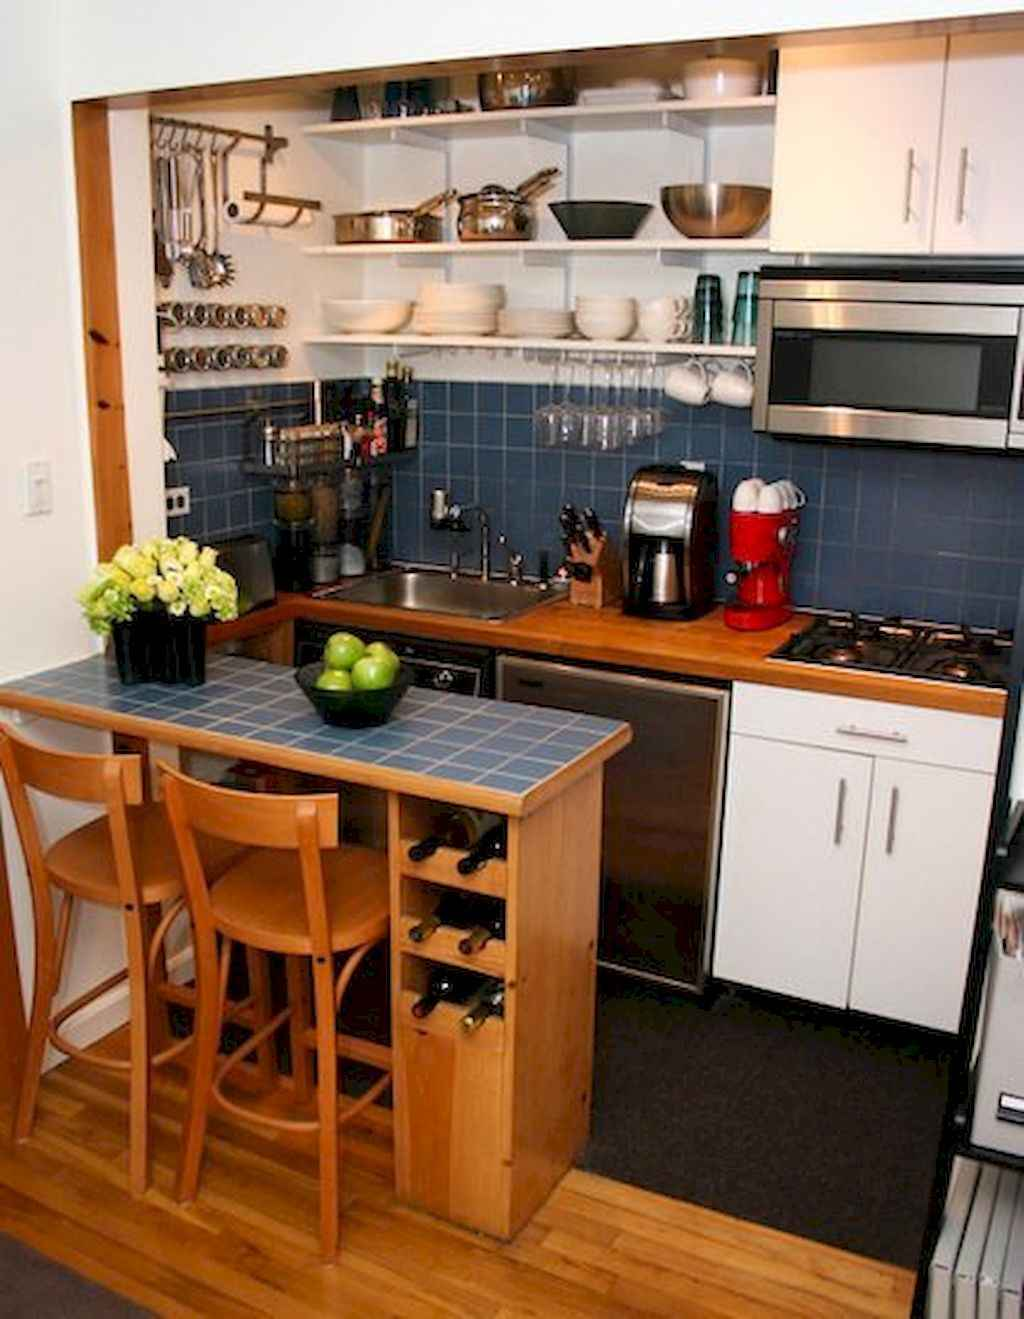 Small Apartment Balcony Garden Ideas: 50 Amazing Small Apartment Kitchen Decor Ideas (32